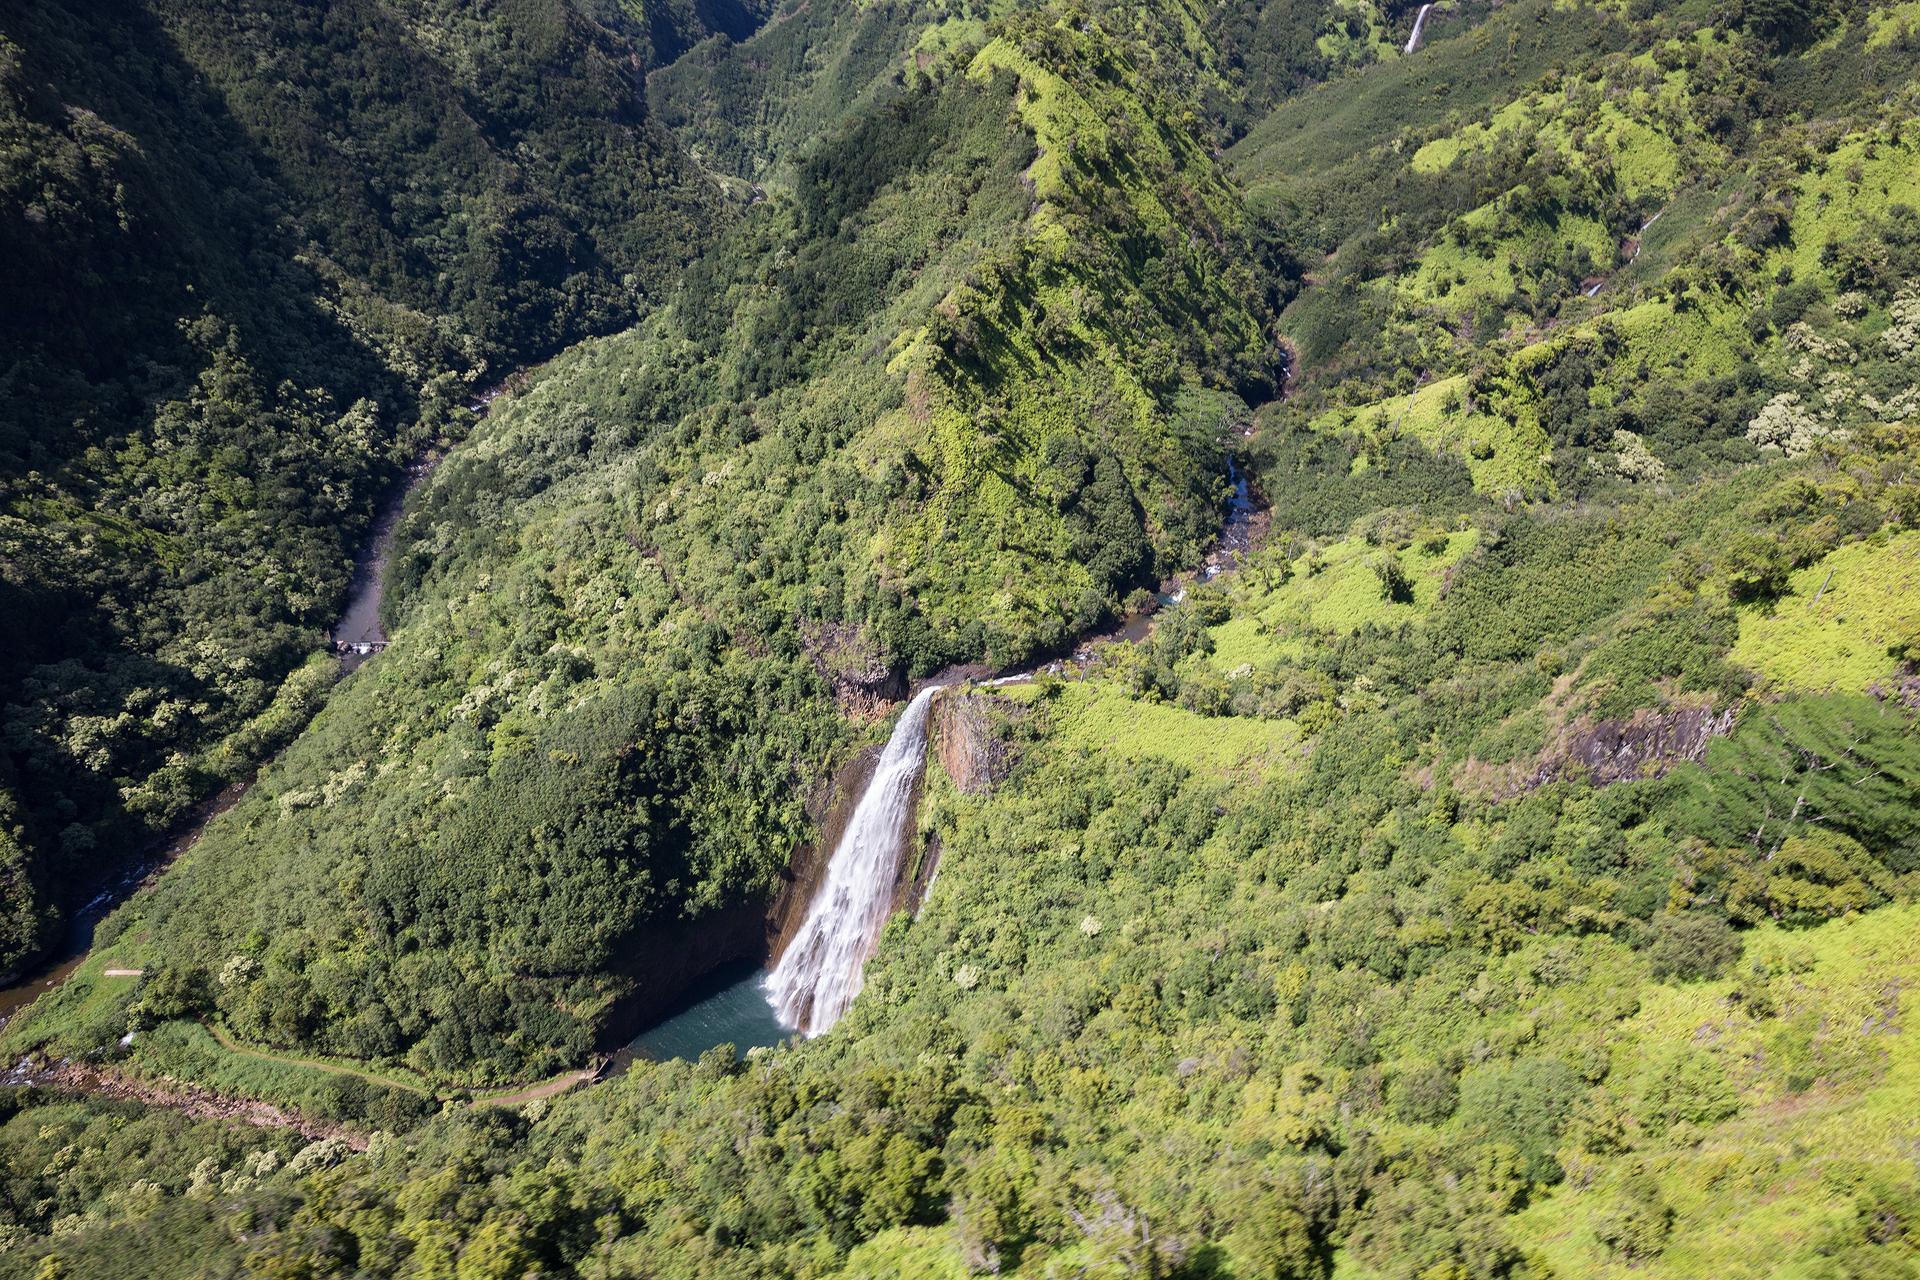 the national parks girl_Kauai_Jack Harter_doors off heli ride_waterfall_napali coast_hawaii_jurassic park_canon6d.JPG